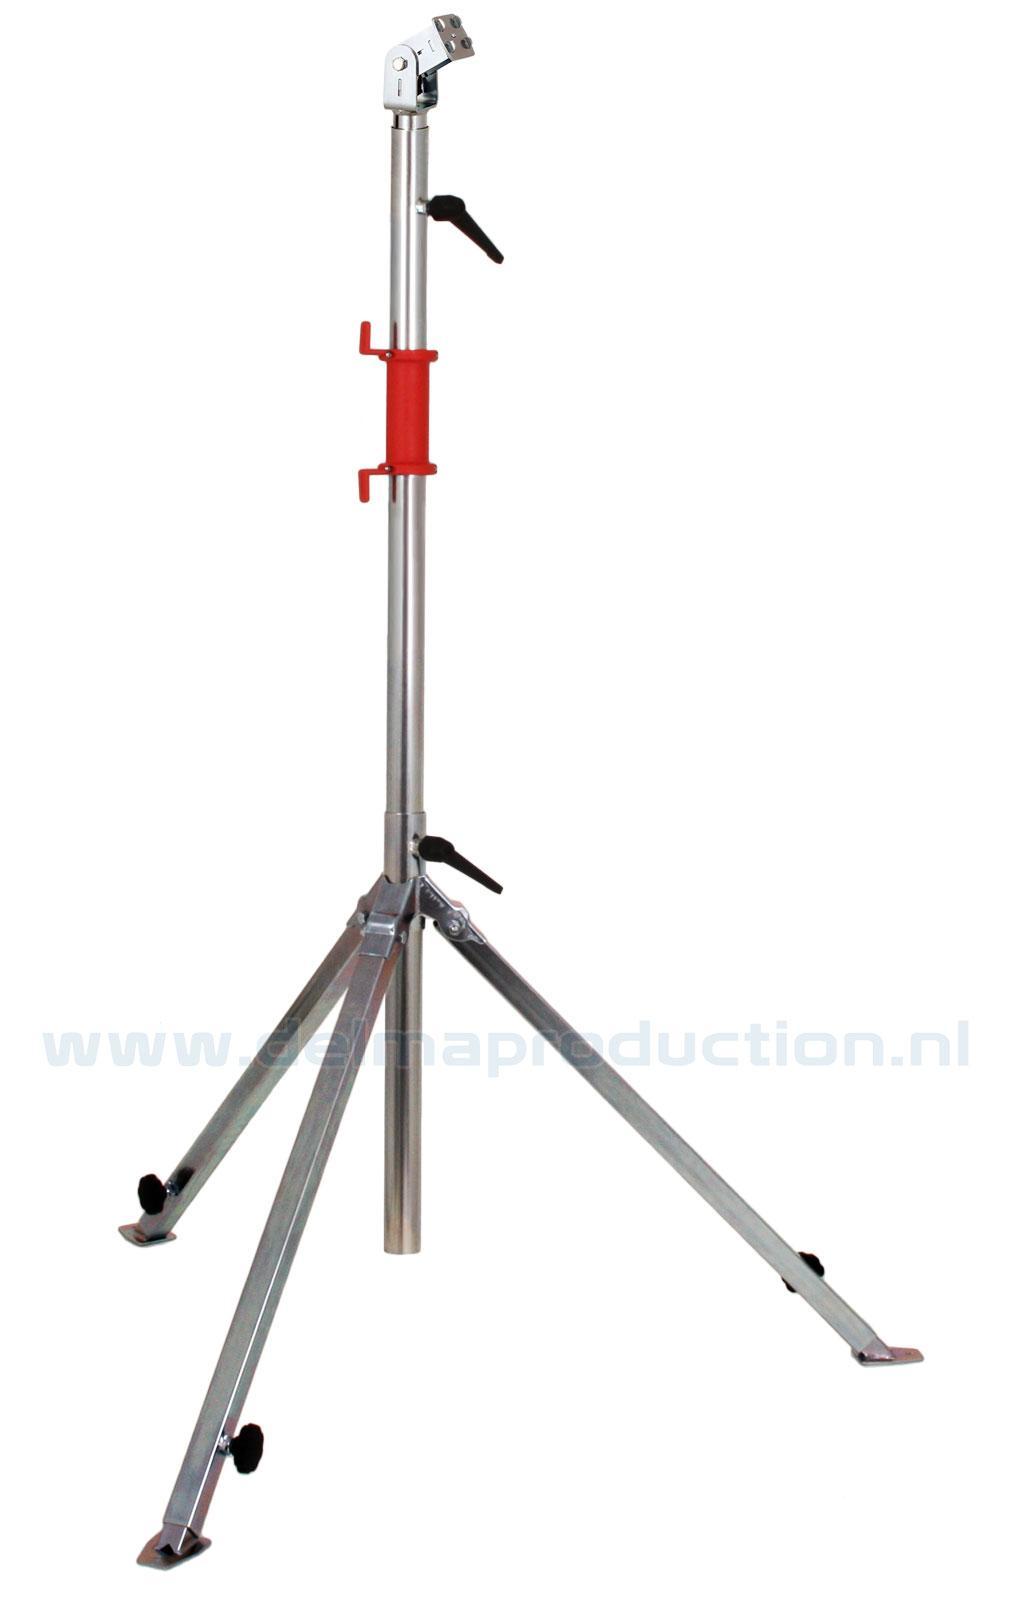 Bau-Teleskop-Stativ 3-teilig, verstellbares Fußgestell, Quick Release System